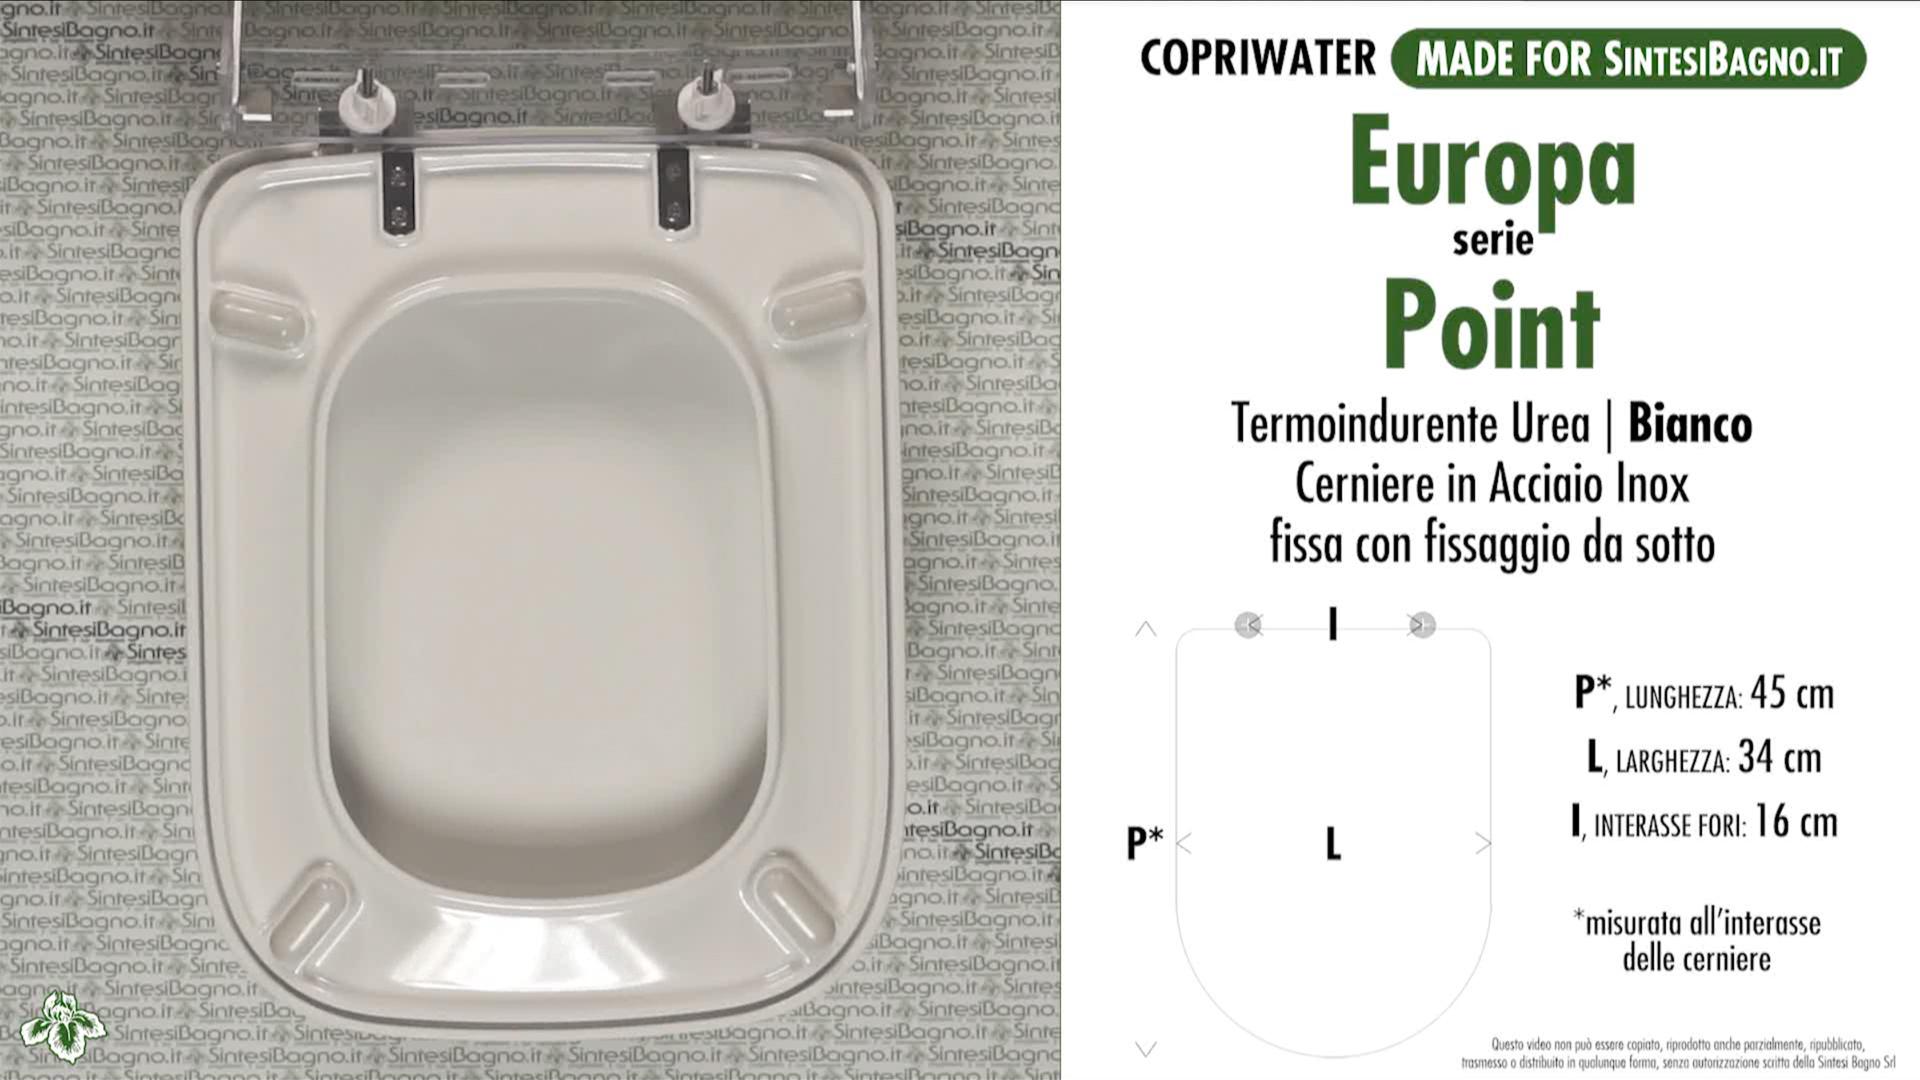 SCHEDA TECNICA MISURE copriwater EUROPA POINT